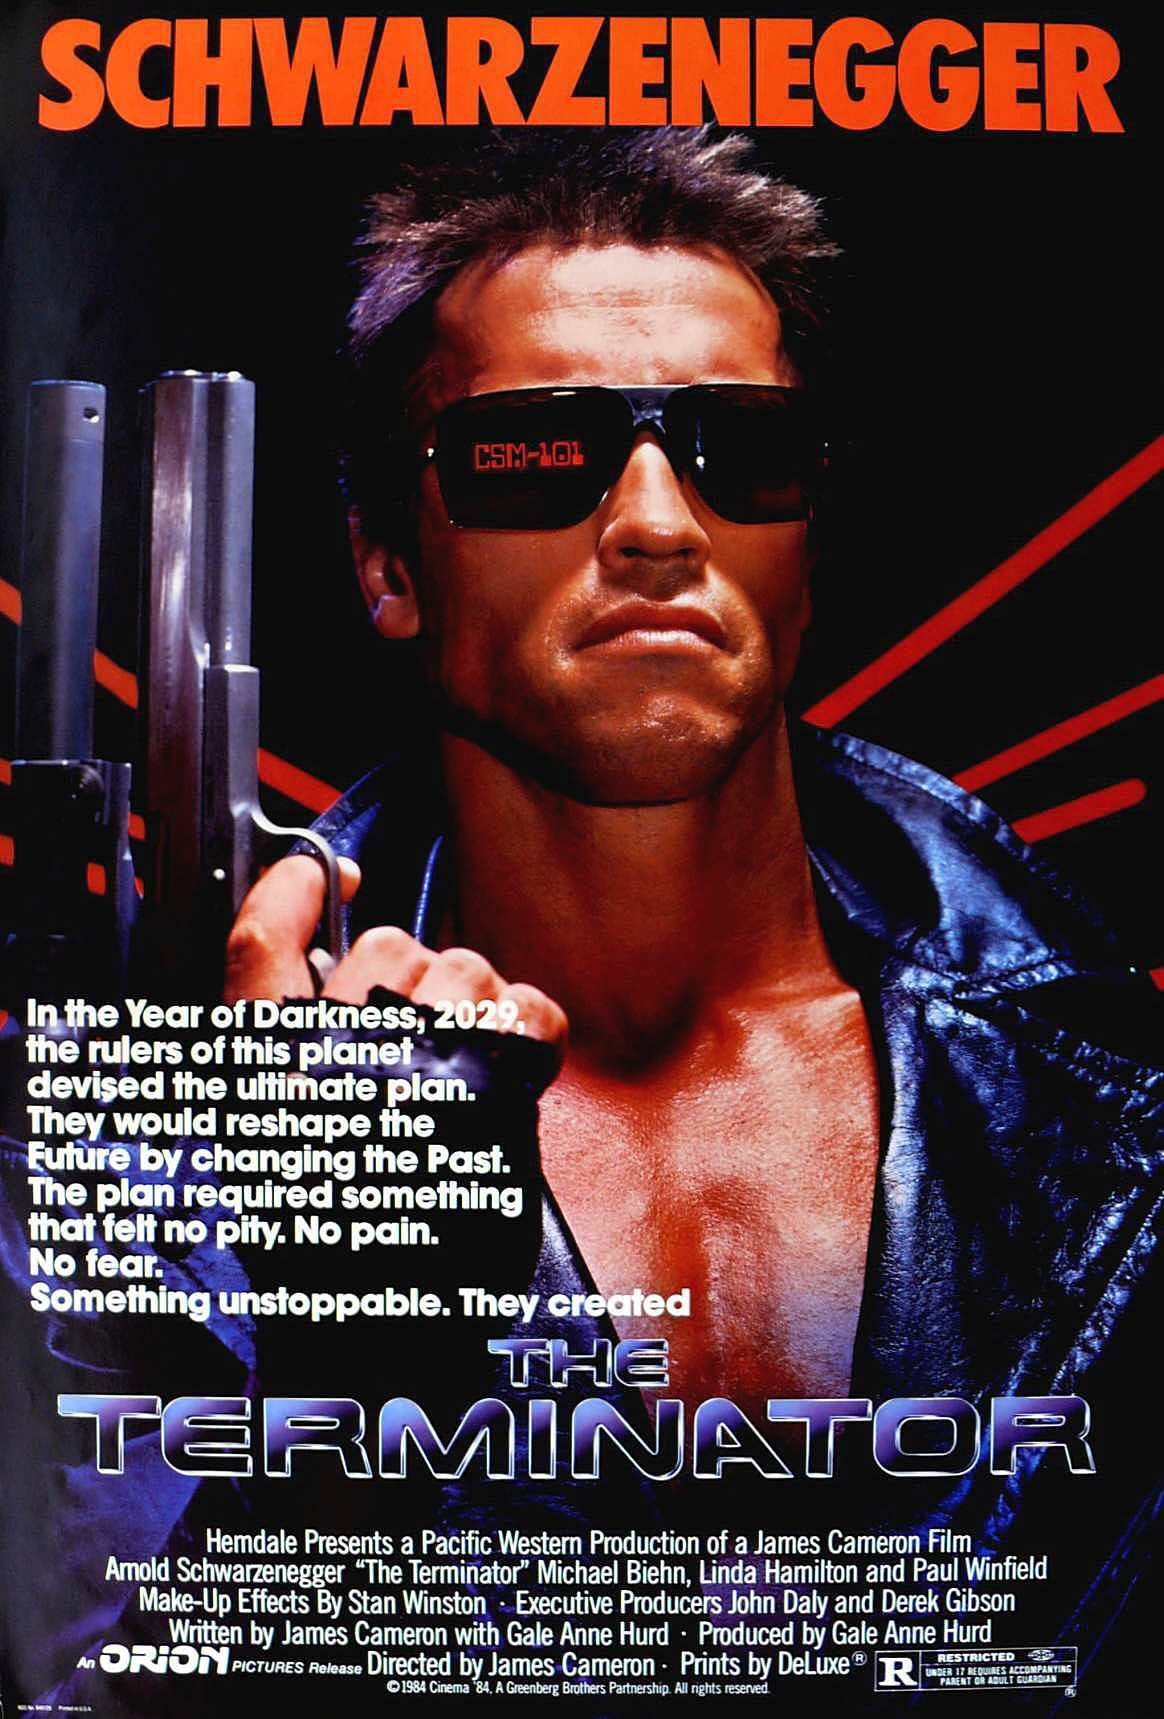 http://www.imfdb.org/images/a/af/Terminator_Poster.jpg